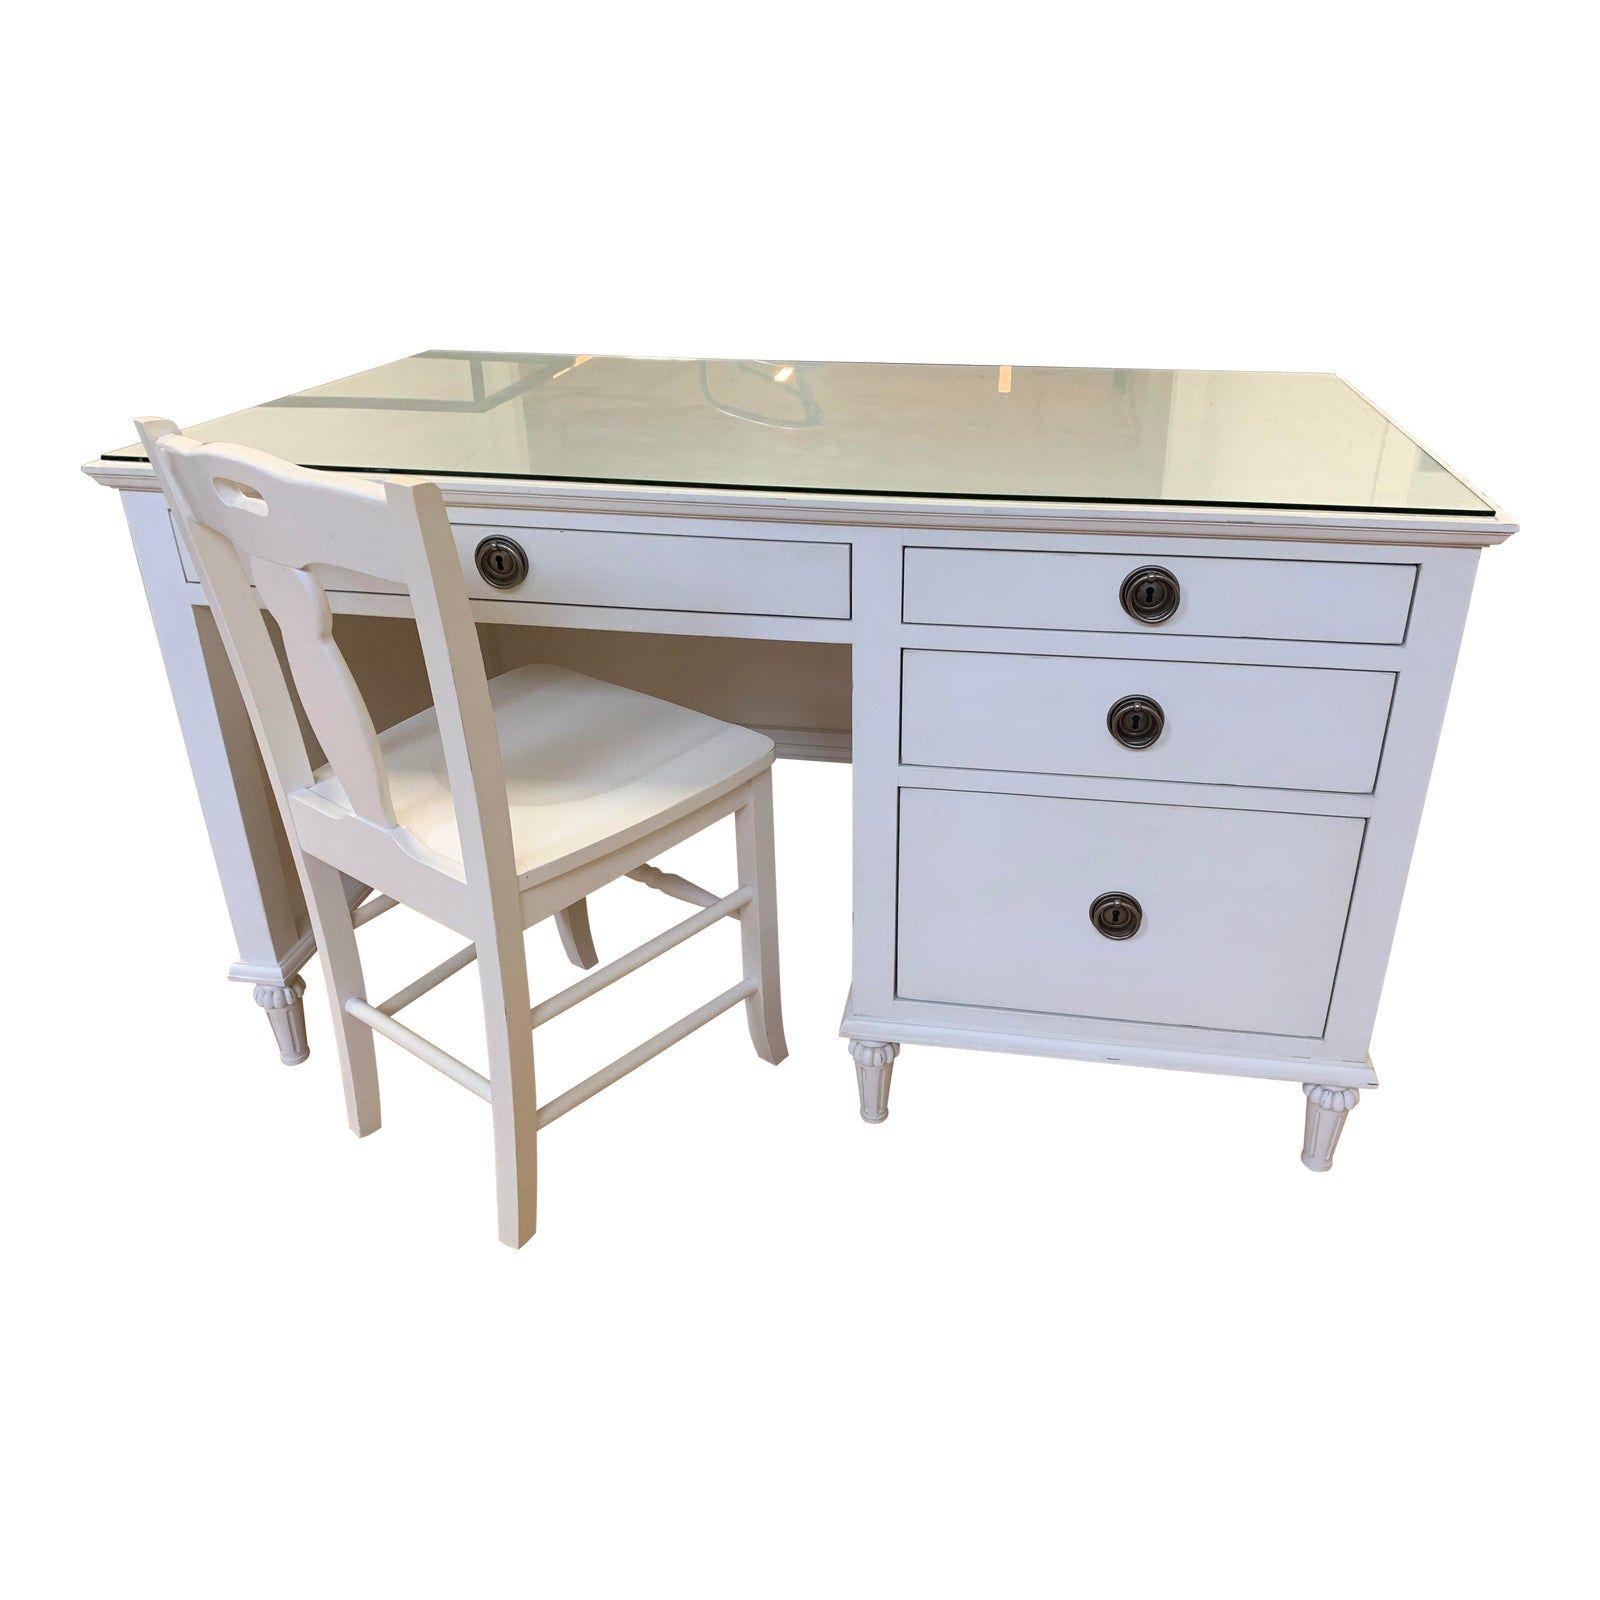 Restoration Hardware Maison Antique White Desk Chairish In 2020 White Desks Restoration Hardware Antique White Desk